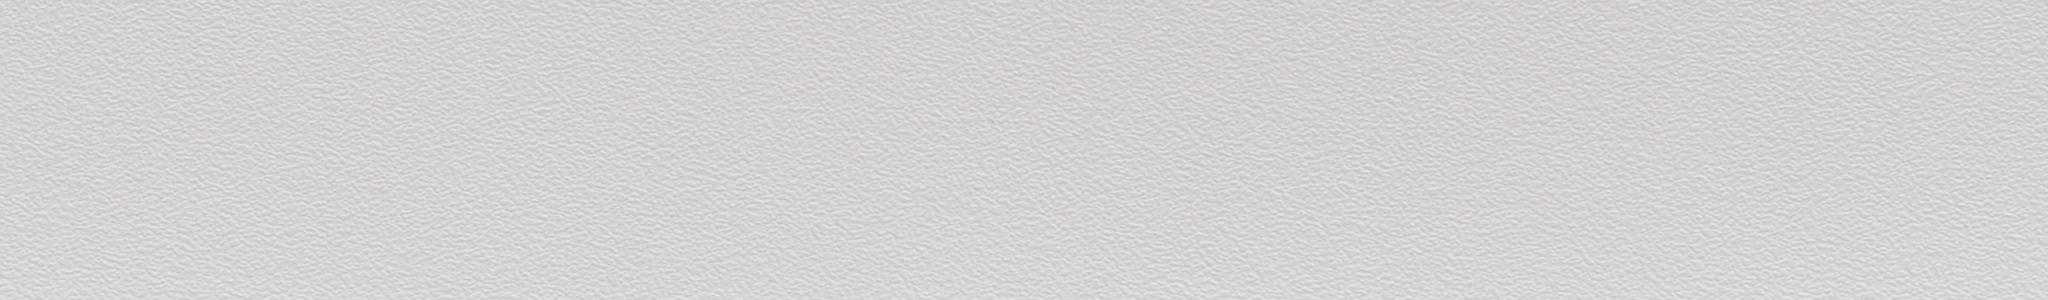 HU 172044 Кромка ABS Дельфин Серый - Шагрень XG